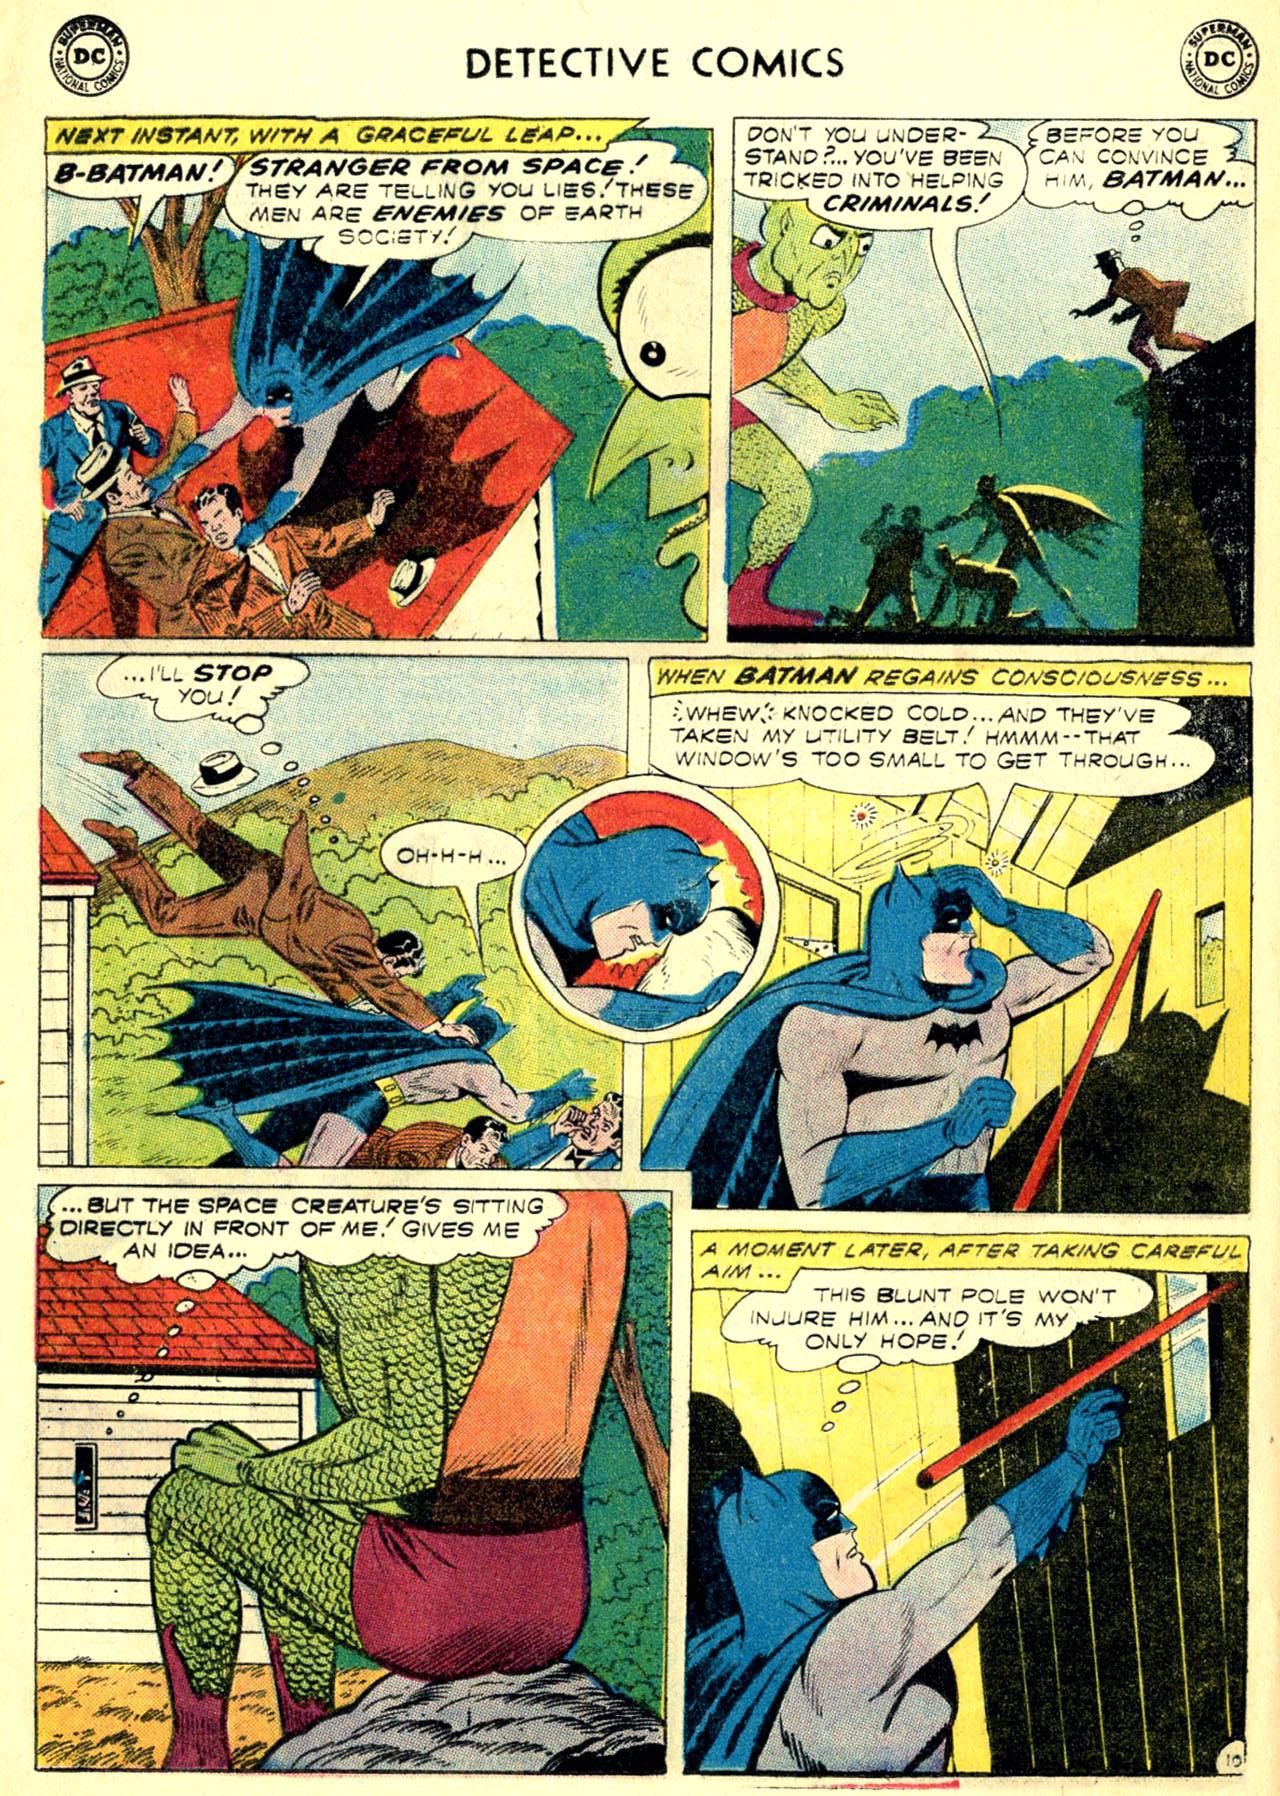 Detective Comics (1937) 270 Page 11